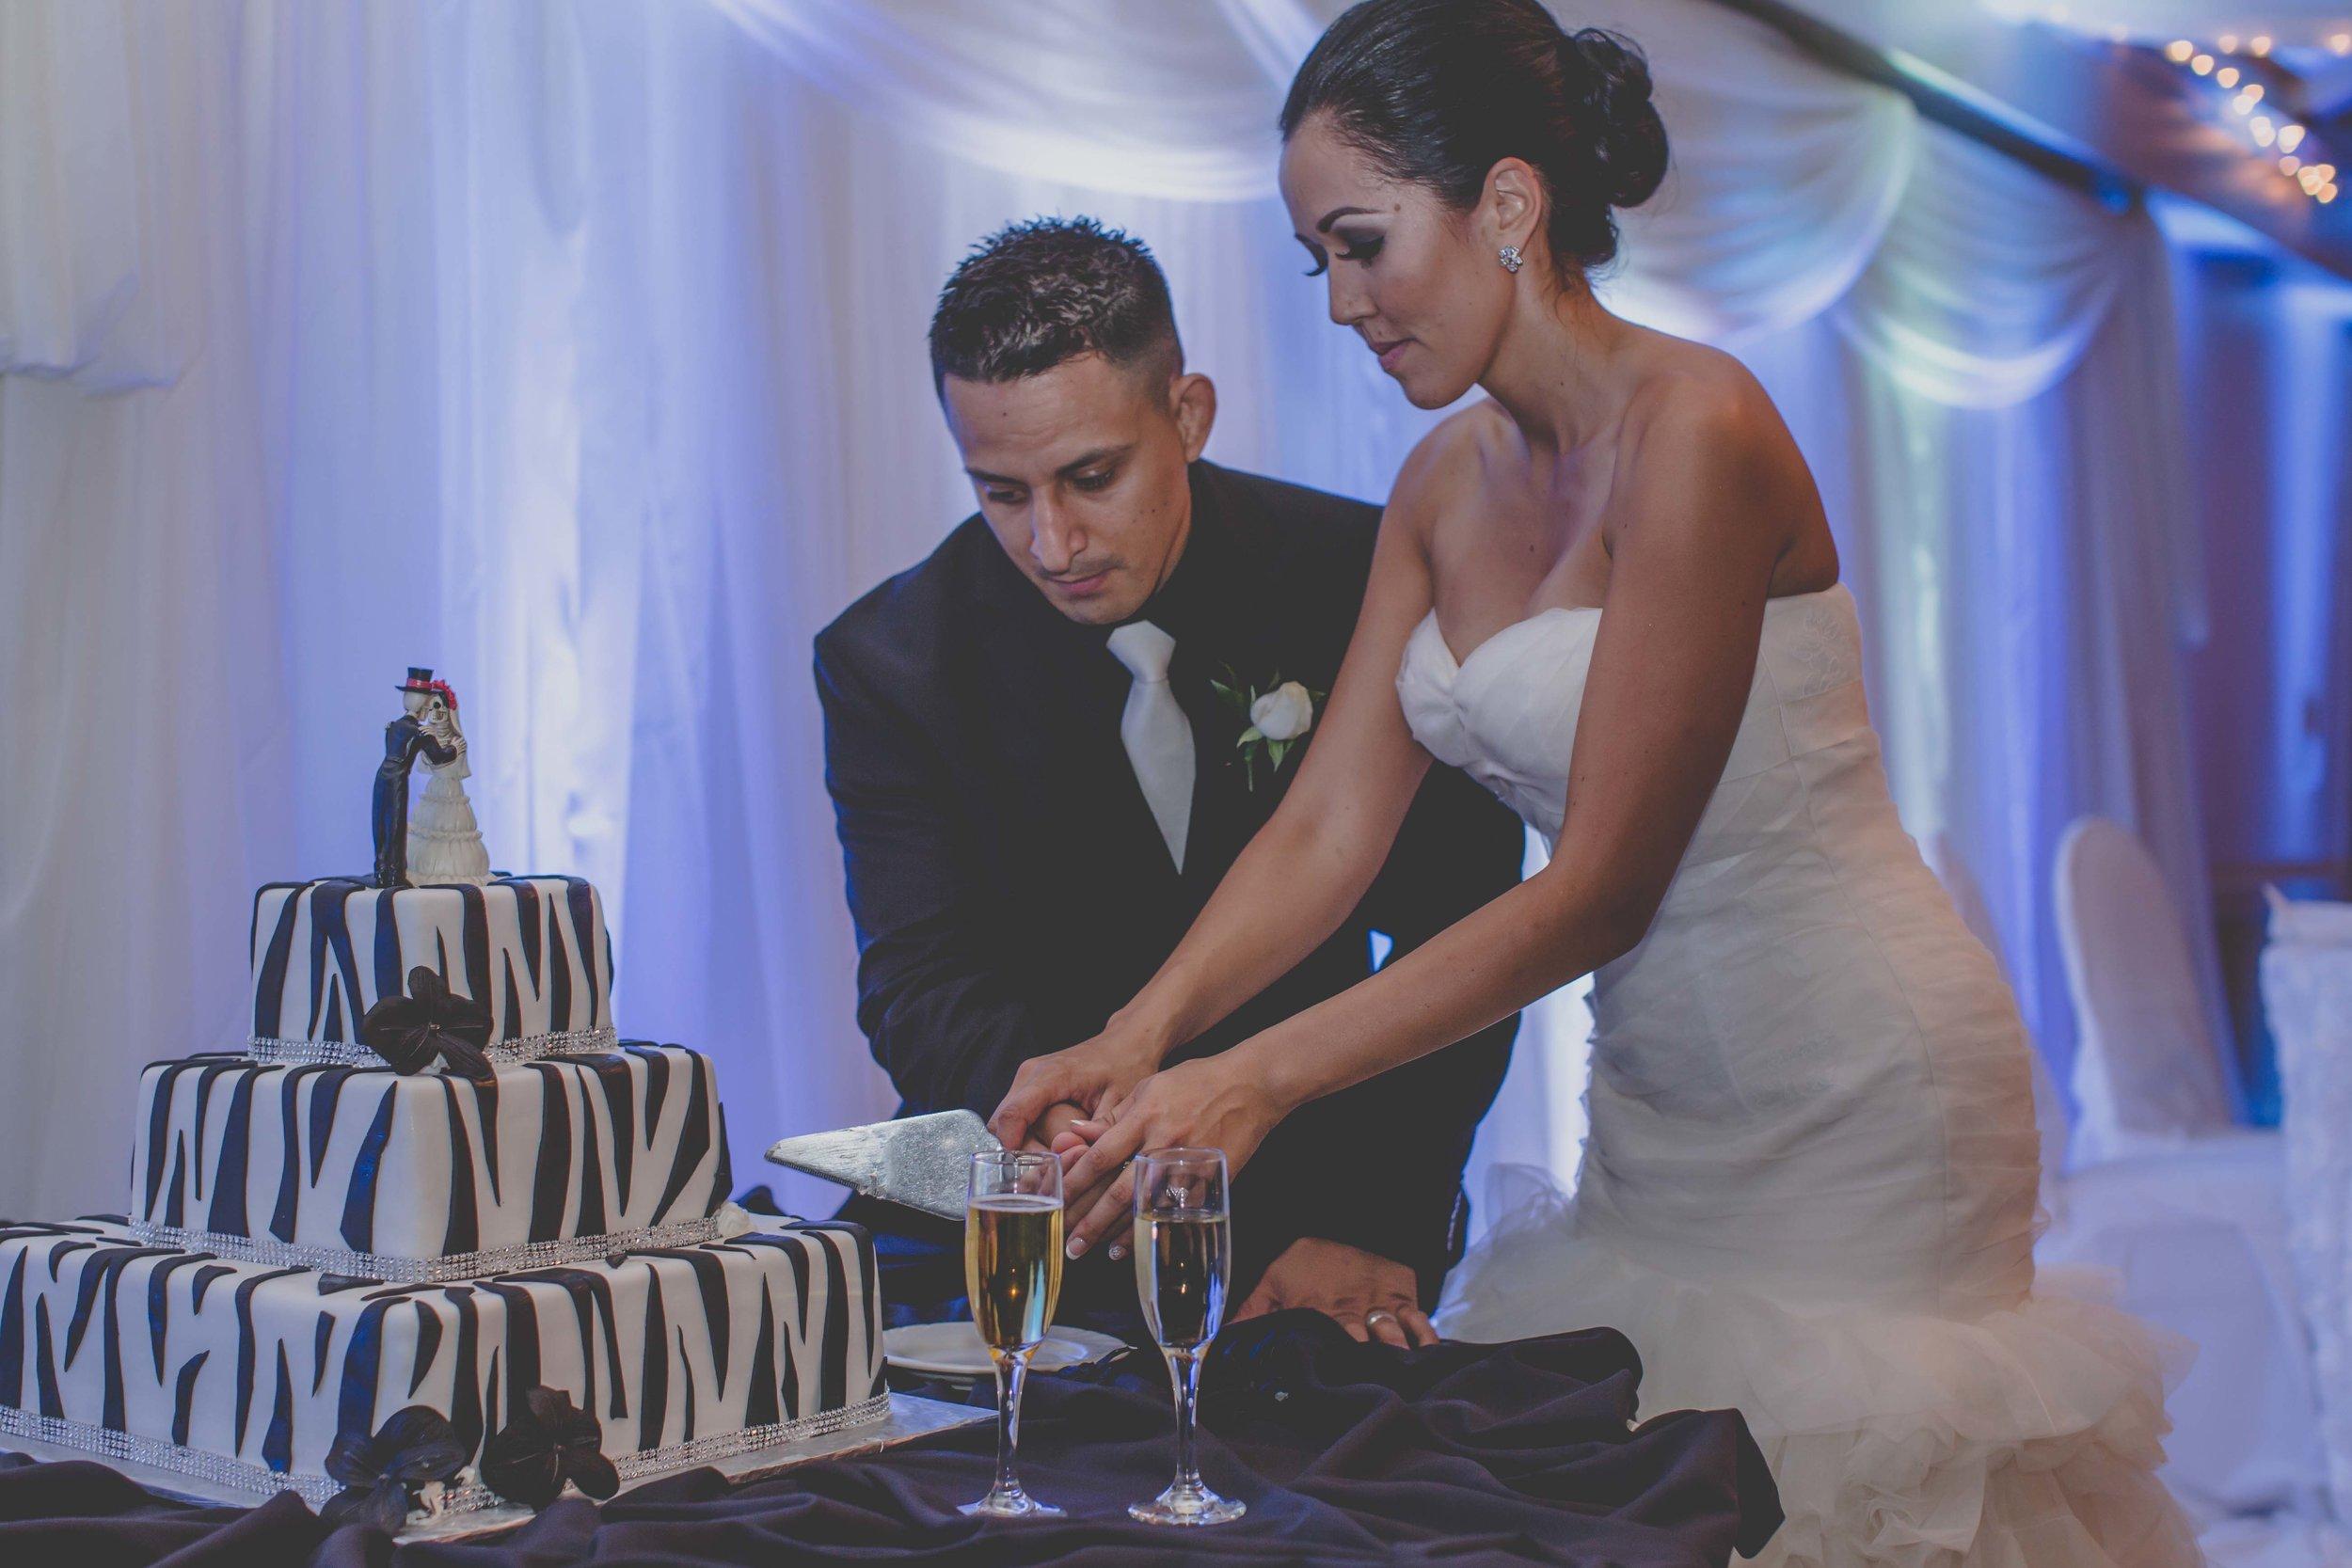 APavone-Photographer-Orange-County-Diamond-Bar-Wedding-085.jpg